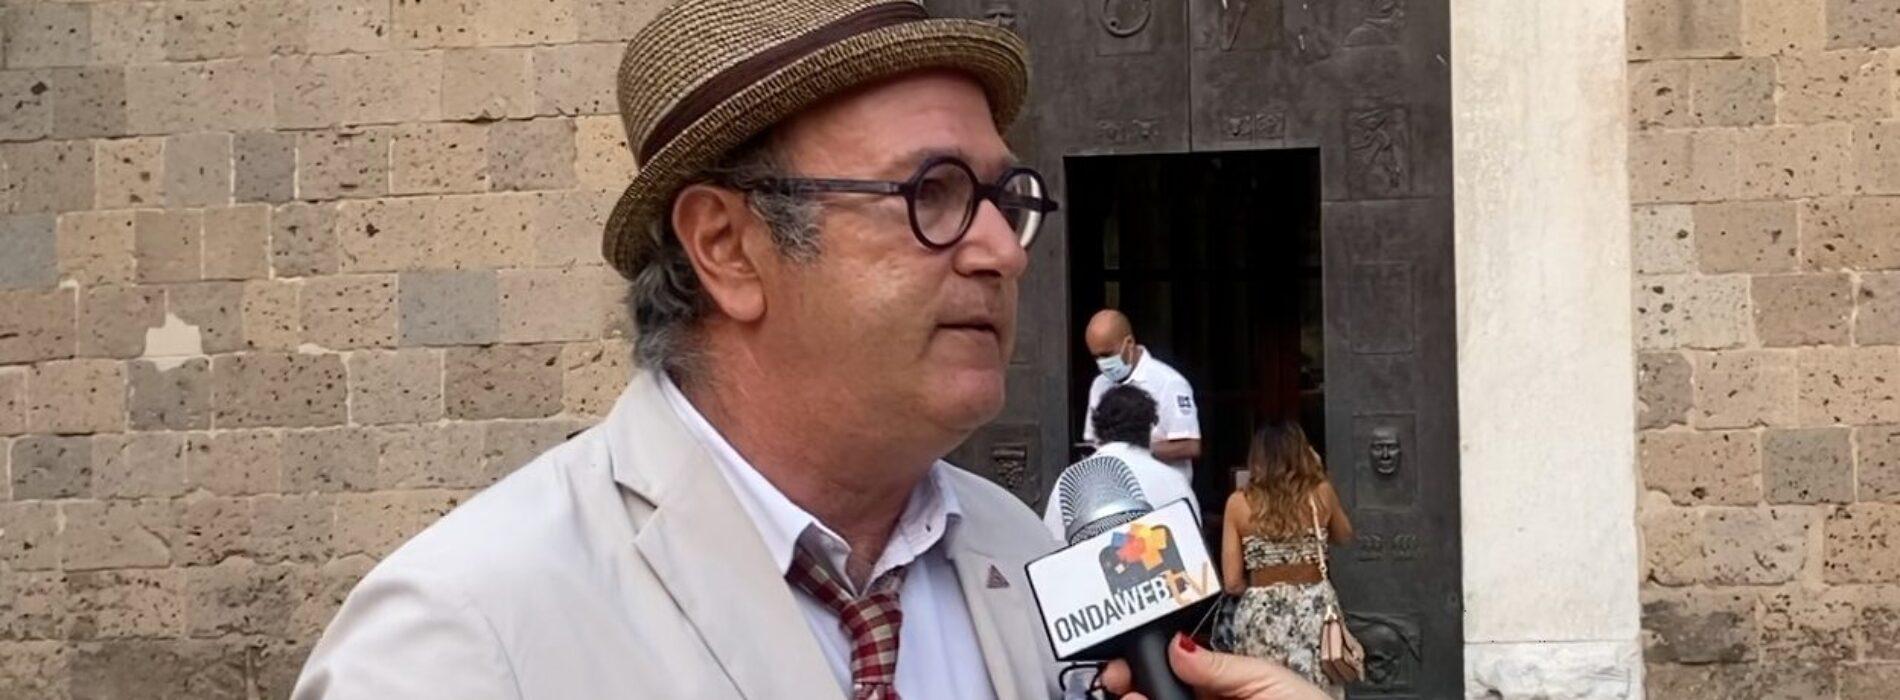 Settembre al Borgo 2020, Francesco Forlani ricorda Pavese